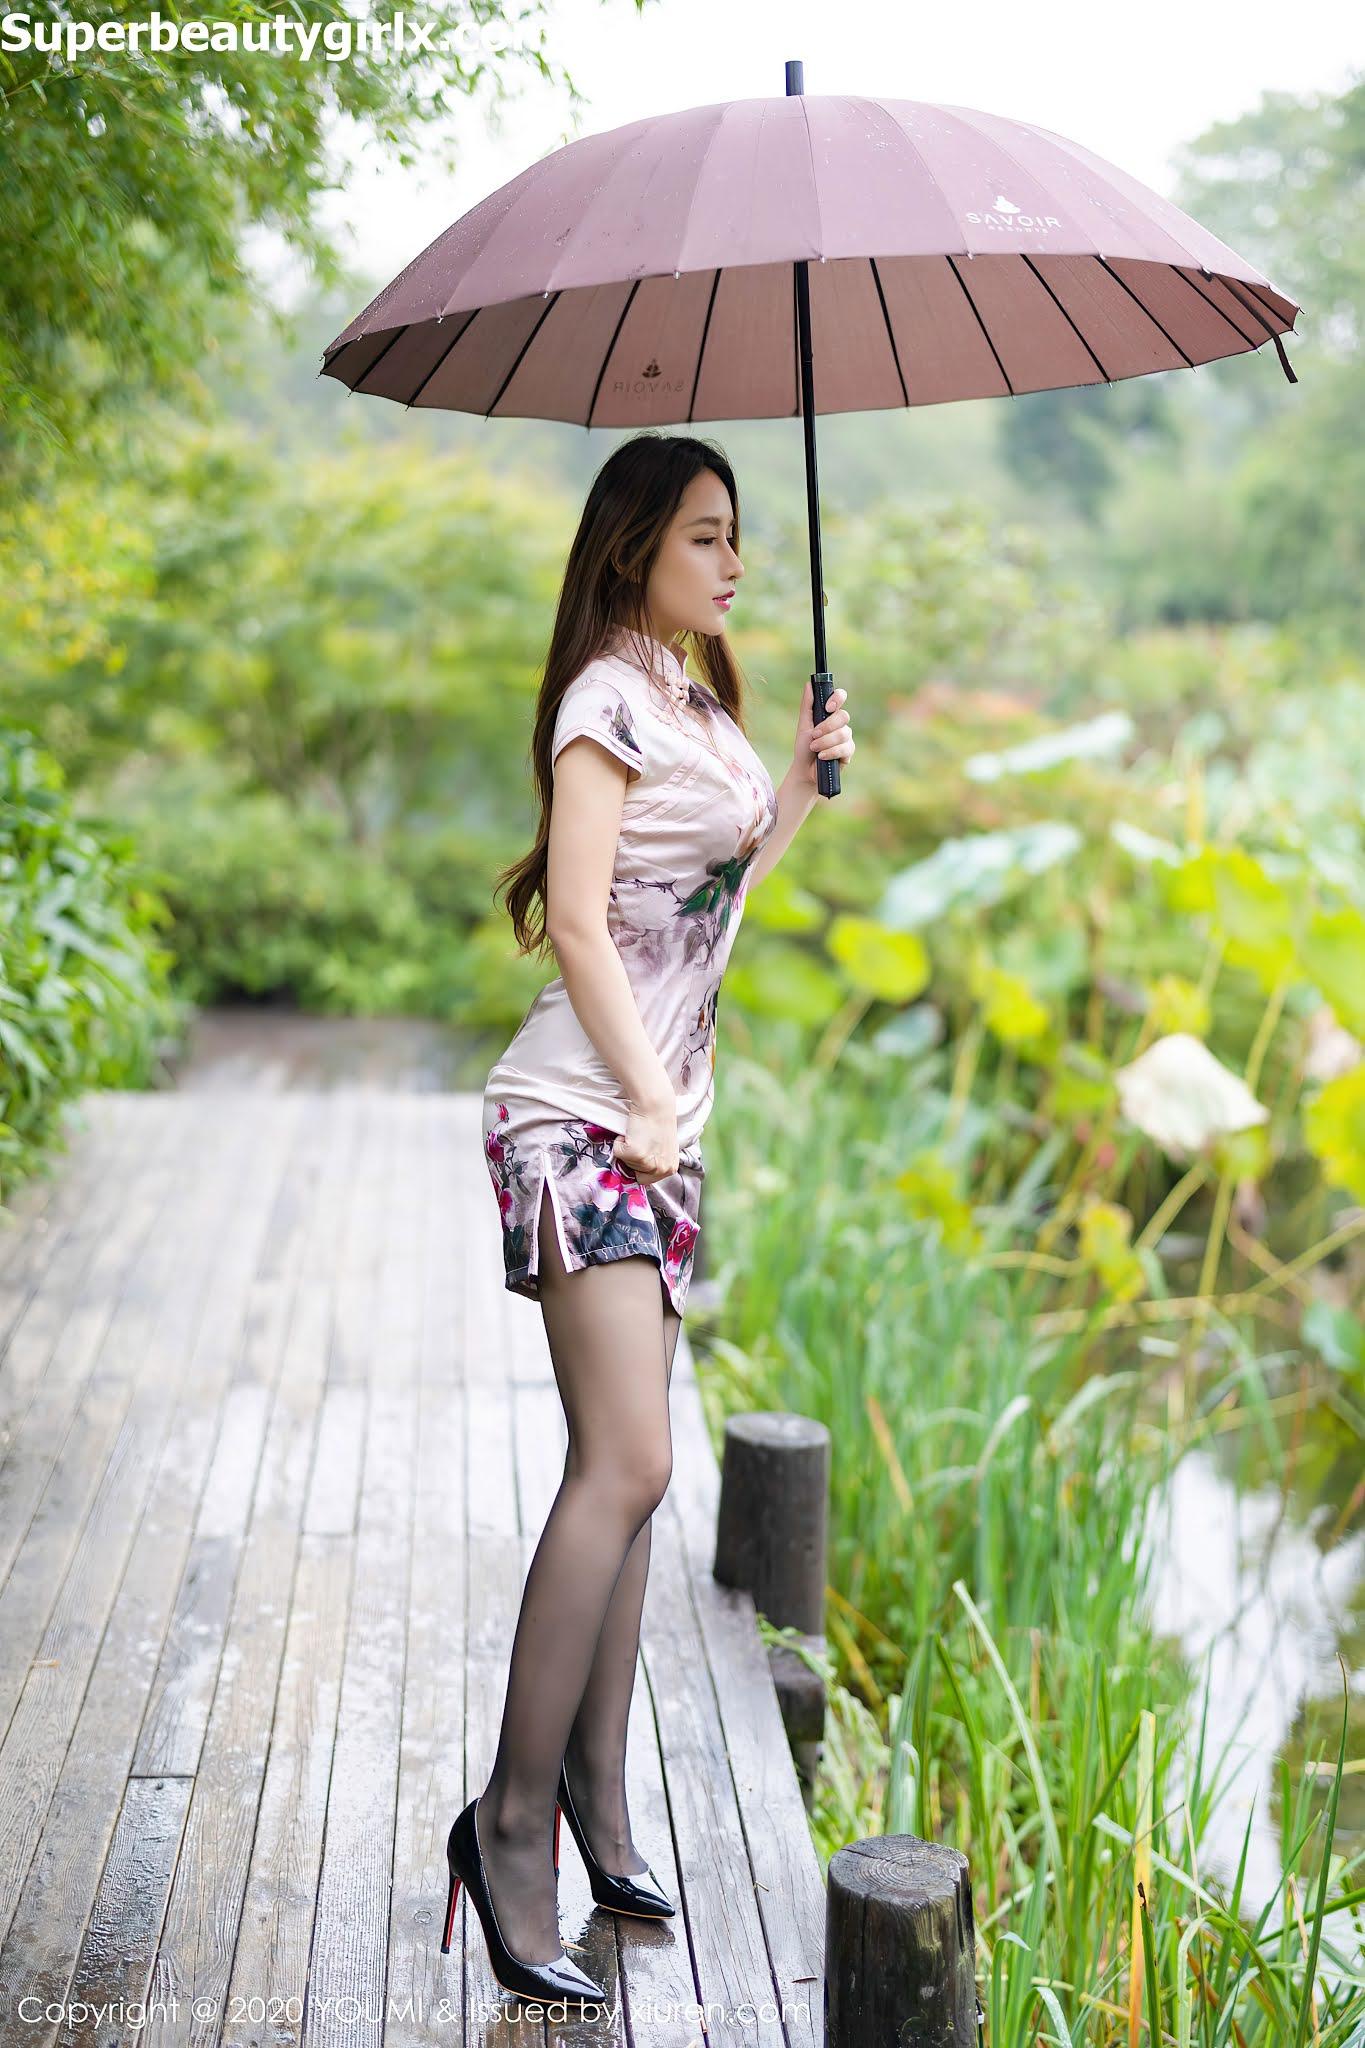 YouMi-Vol.575-Xu-An-An-Superbeautygirlx.com